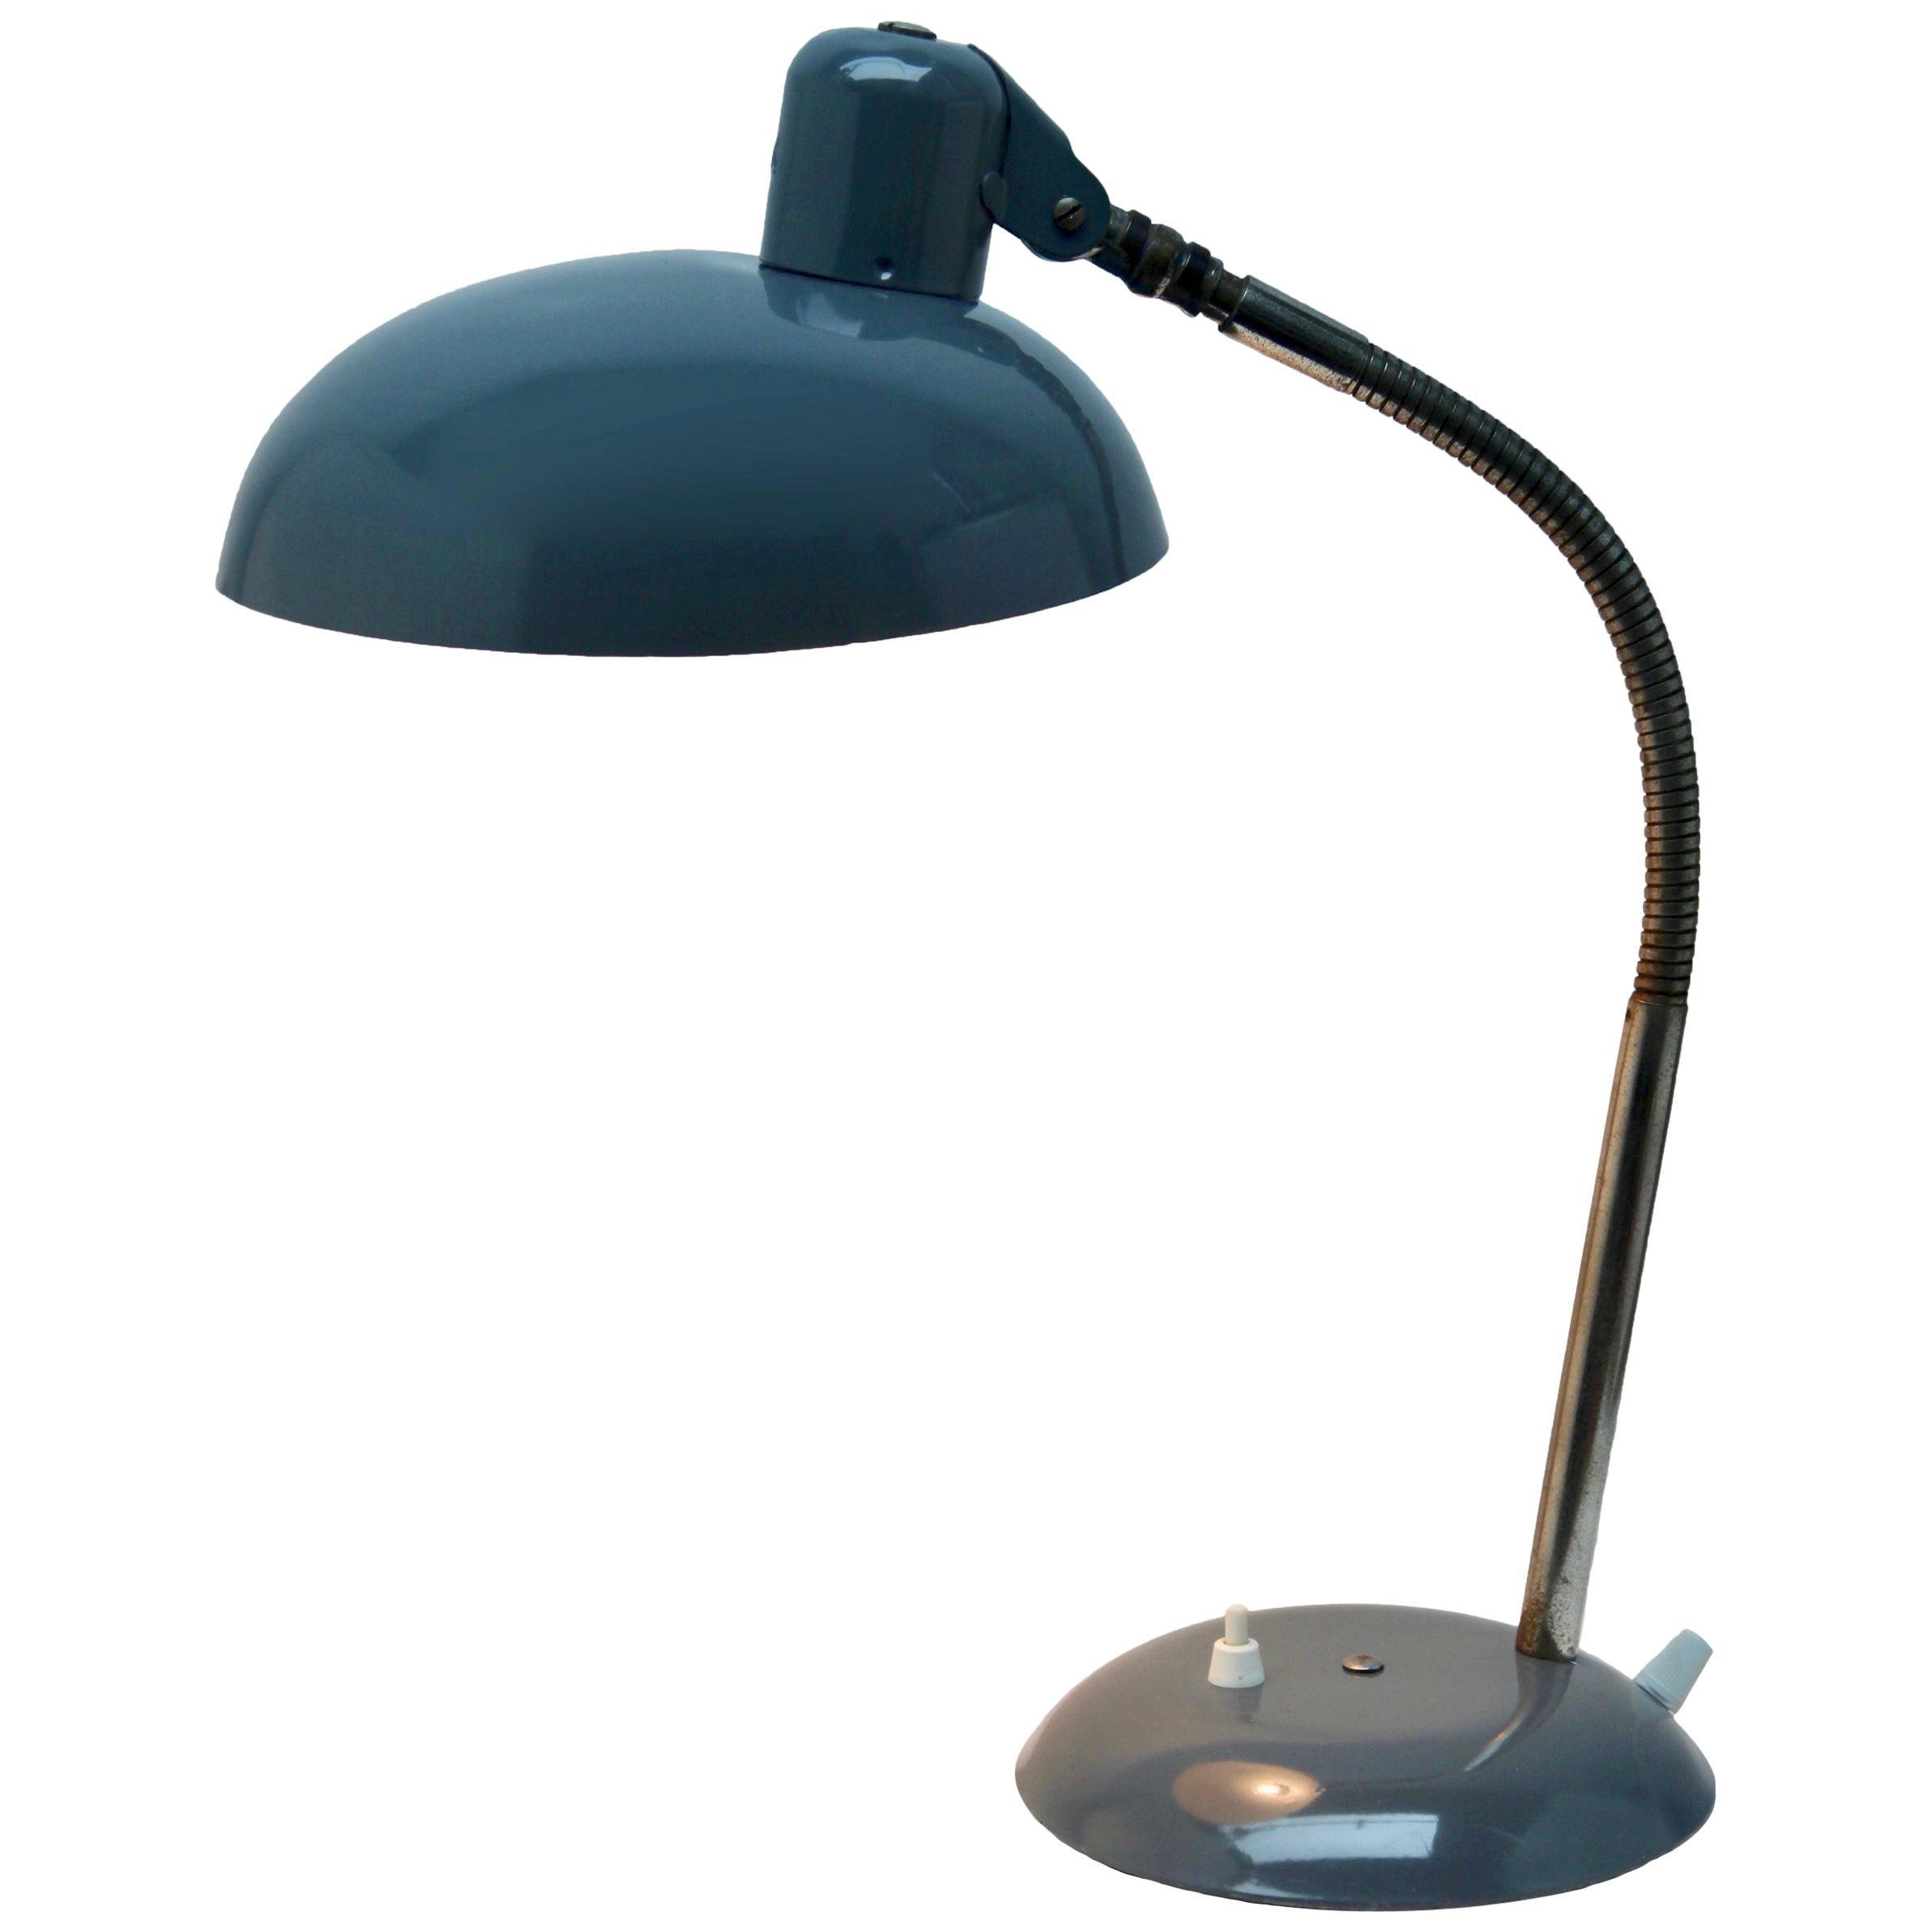 Vintage Gray Adjustable Desk/Side Table Lamp by Sis, 1950s